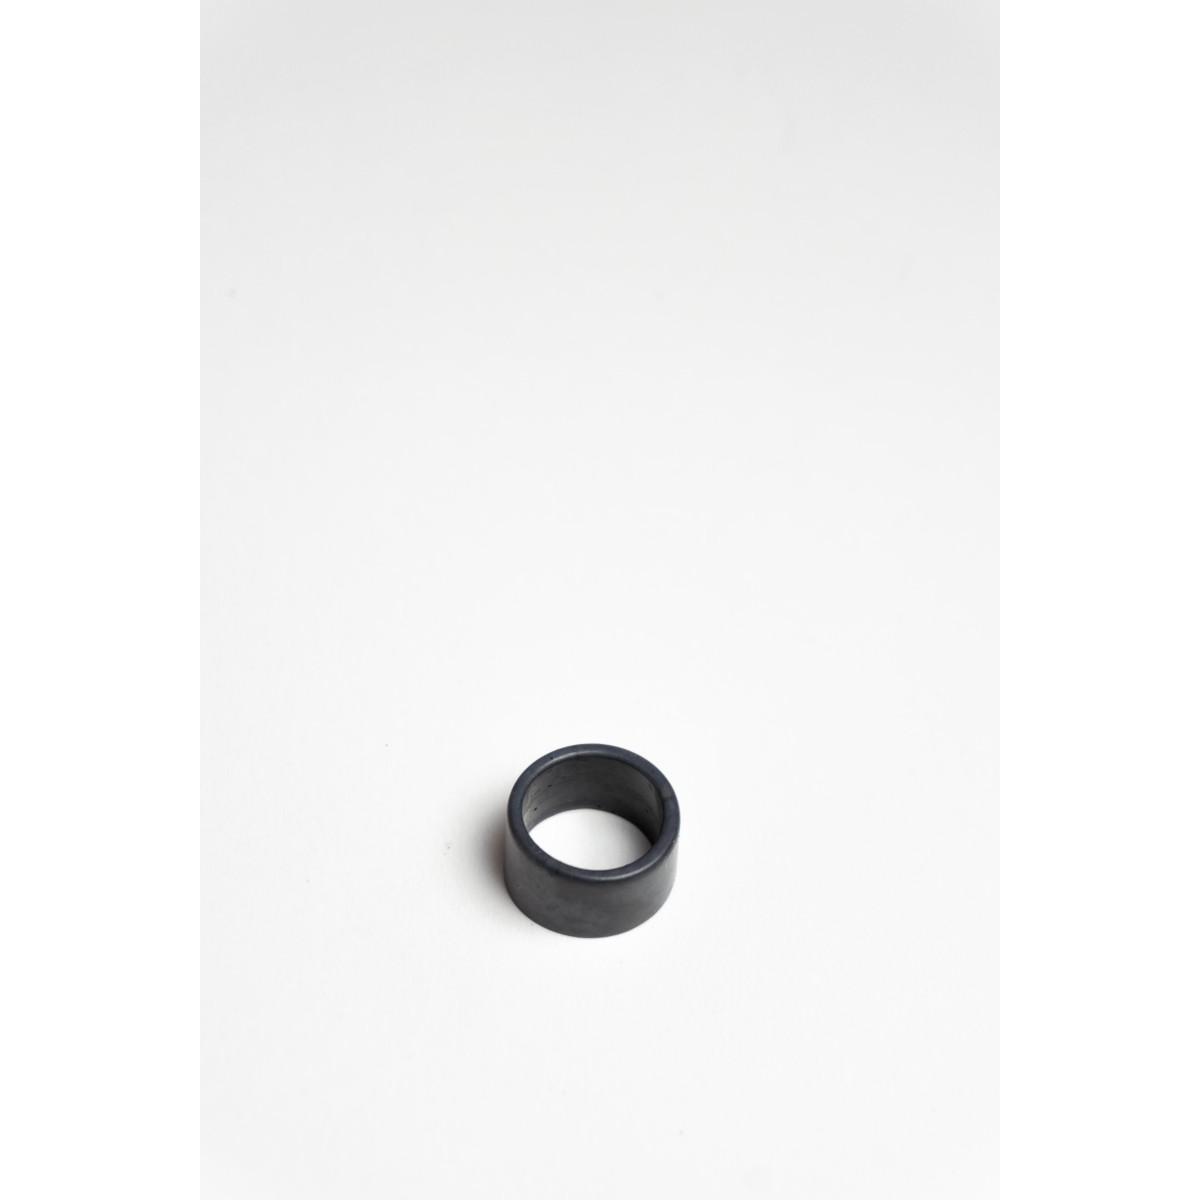 Klunkergrau Betonschmuck | Dunkler Ring aus Beton